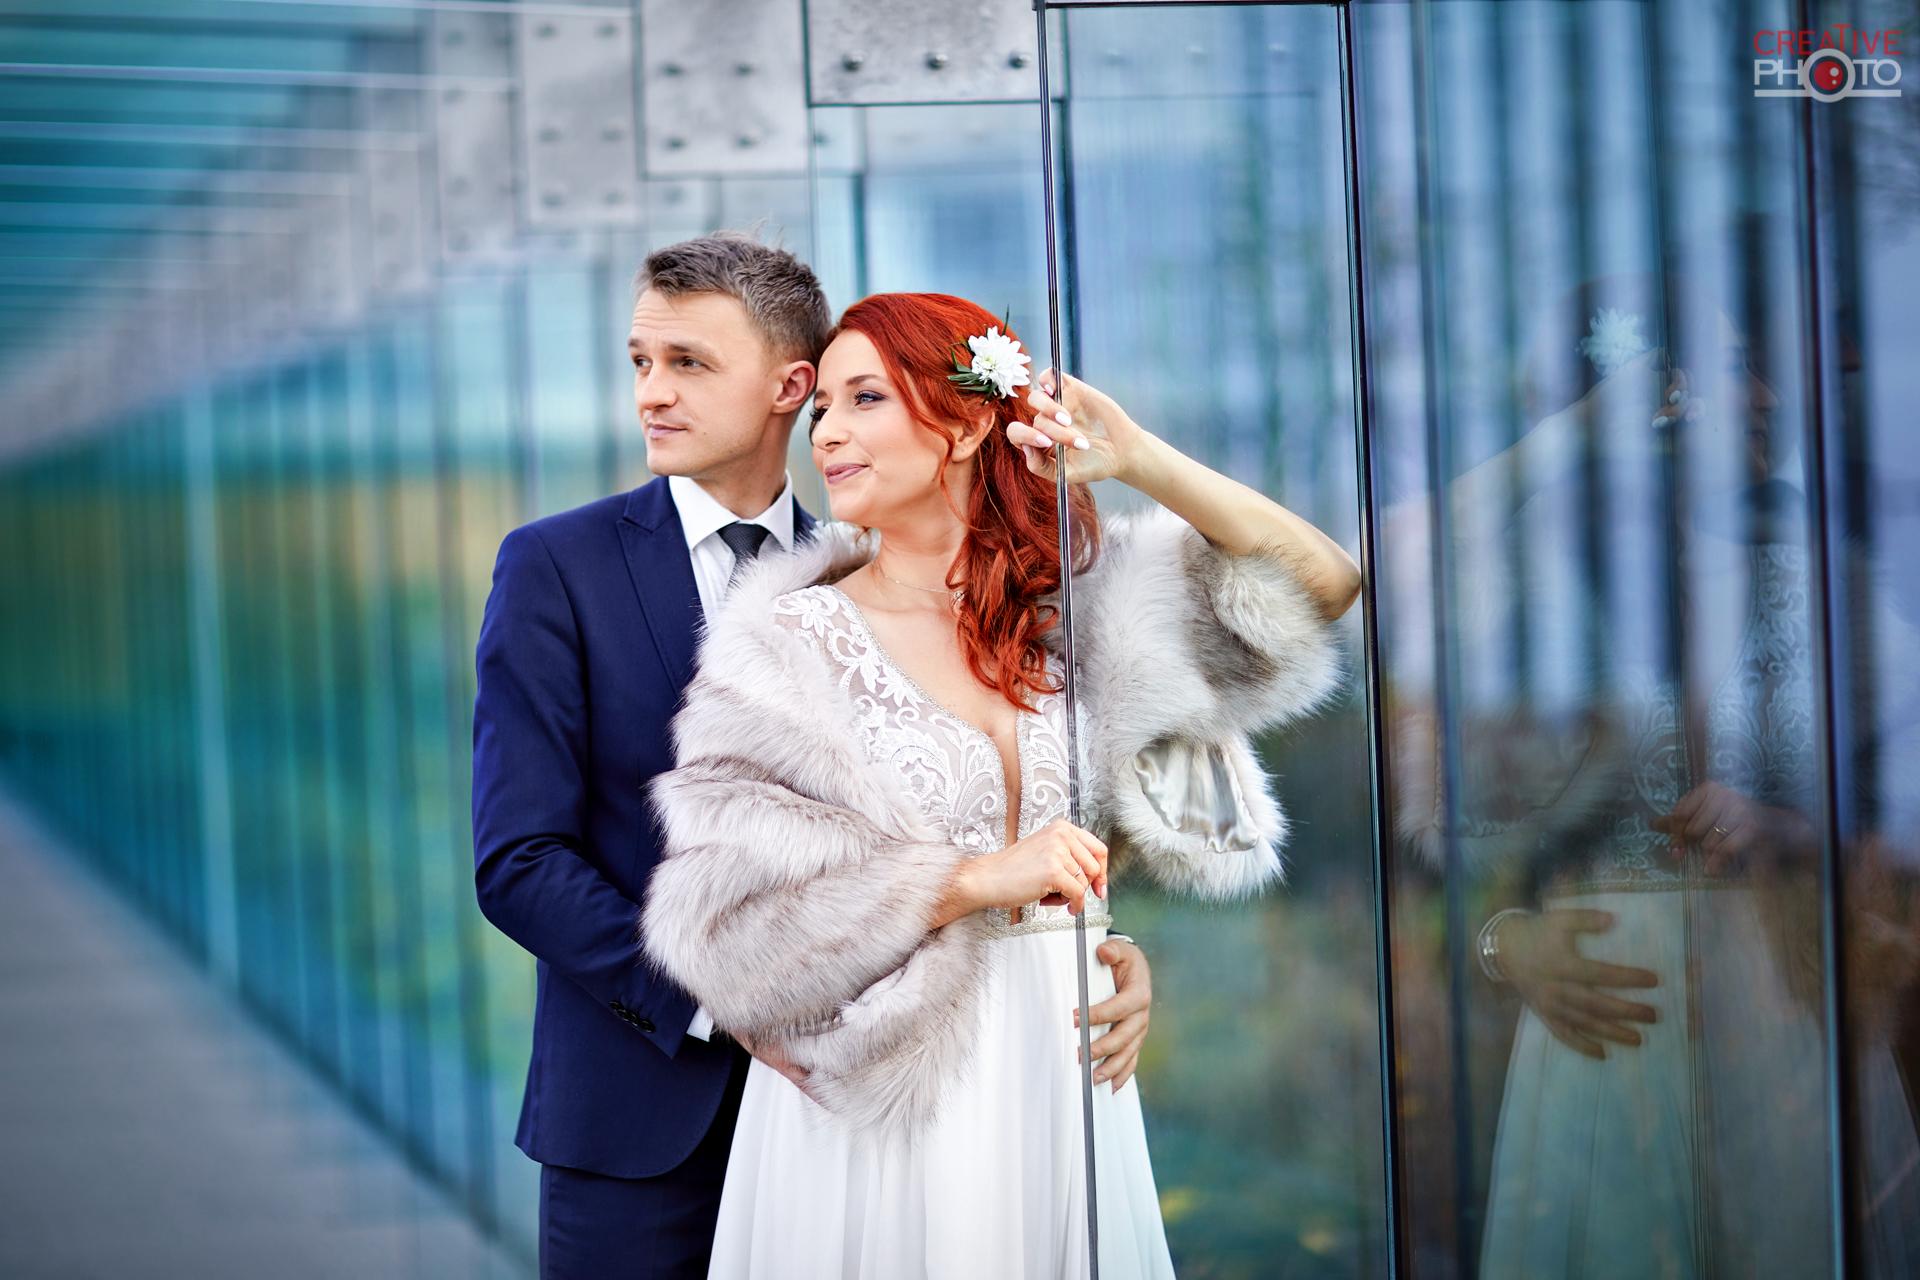 creativephoto-eu-_-sesja-plenerowa-_-33